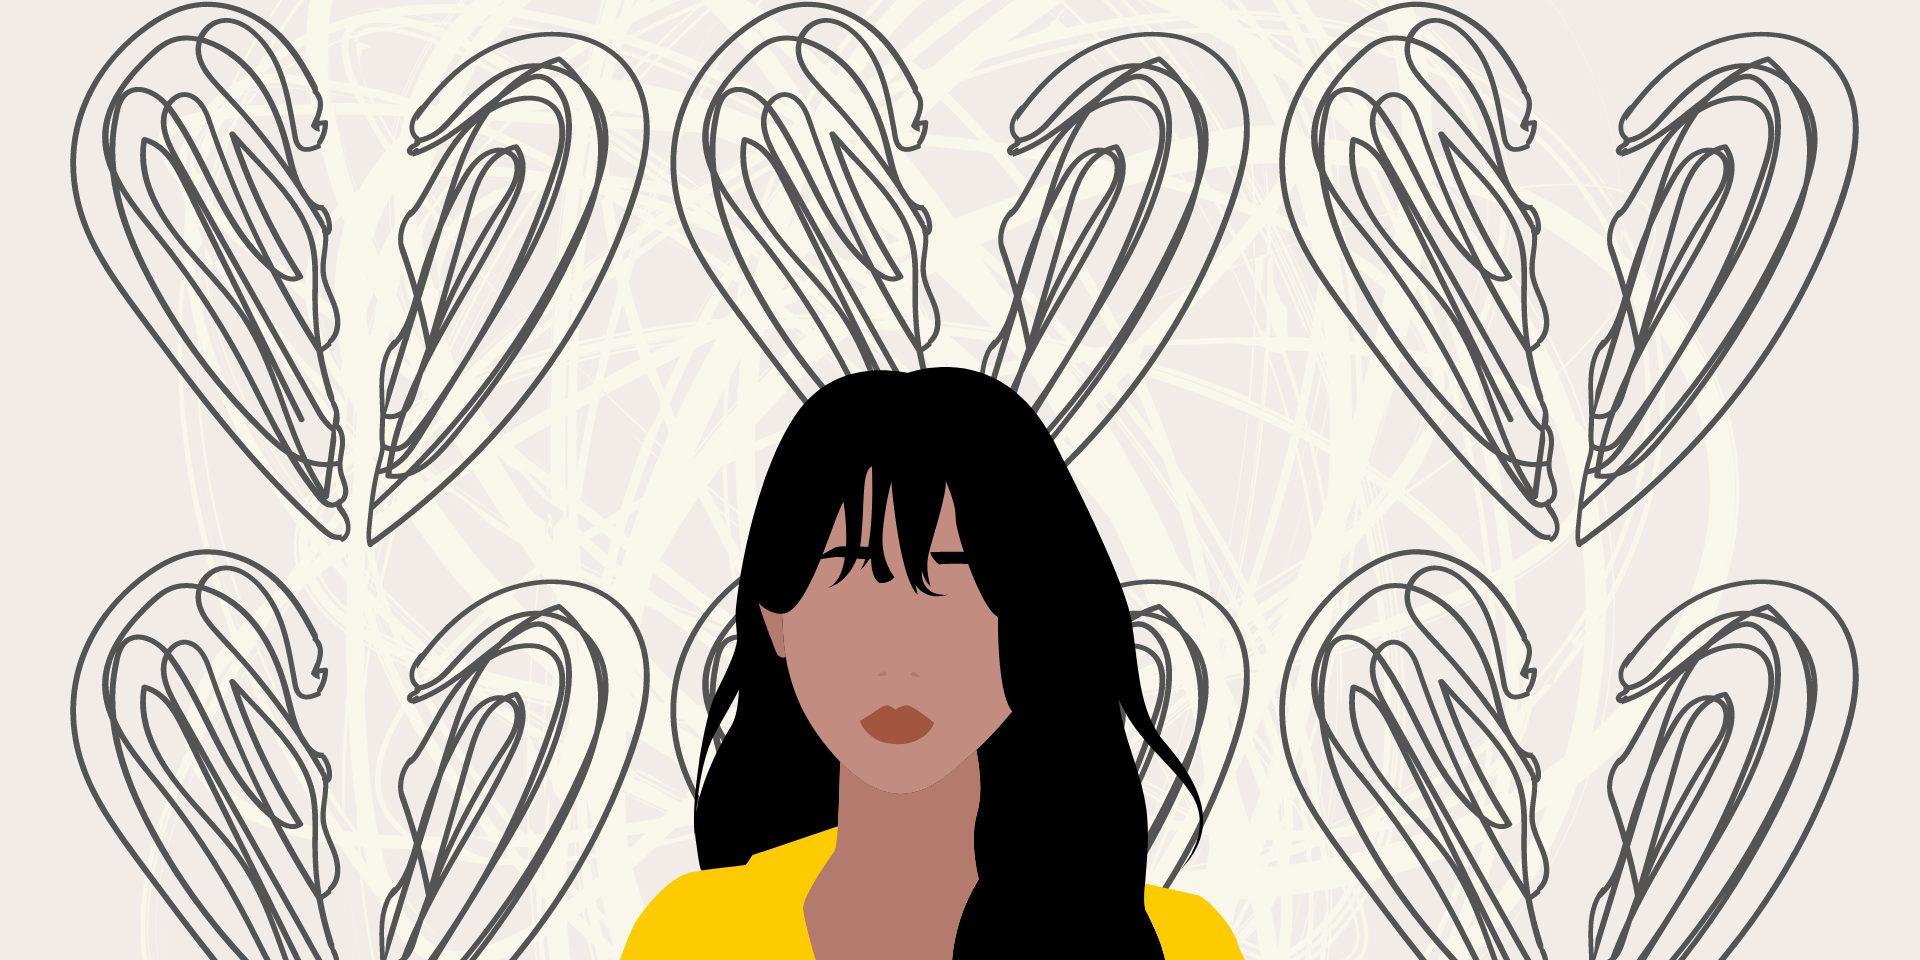 Postpartum Depression and Postpartum Psychosis